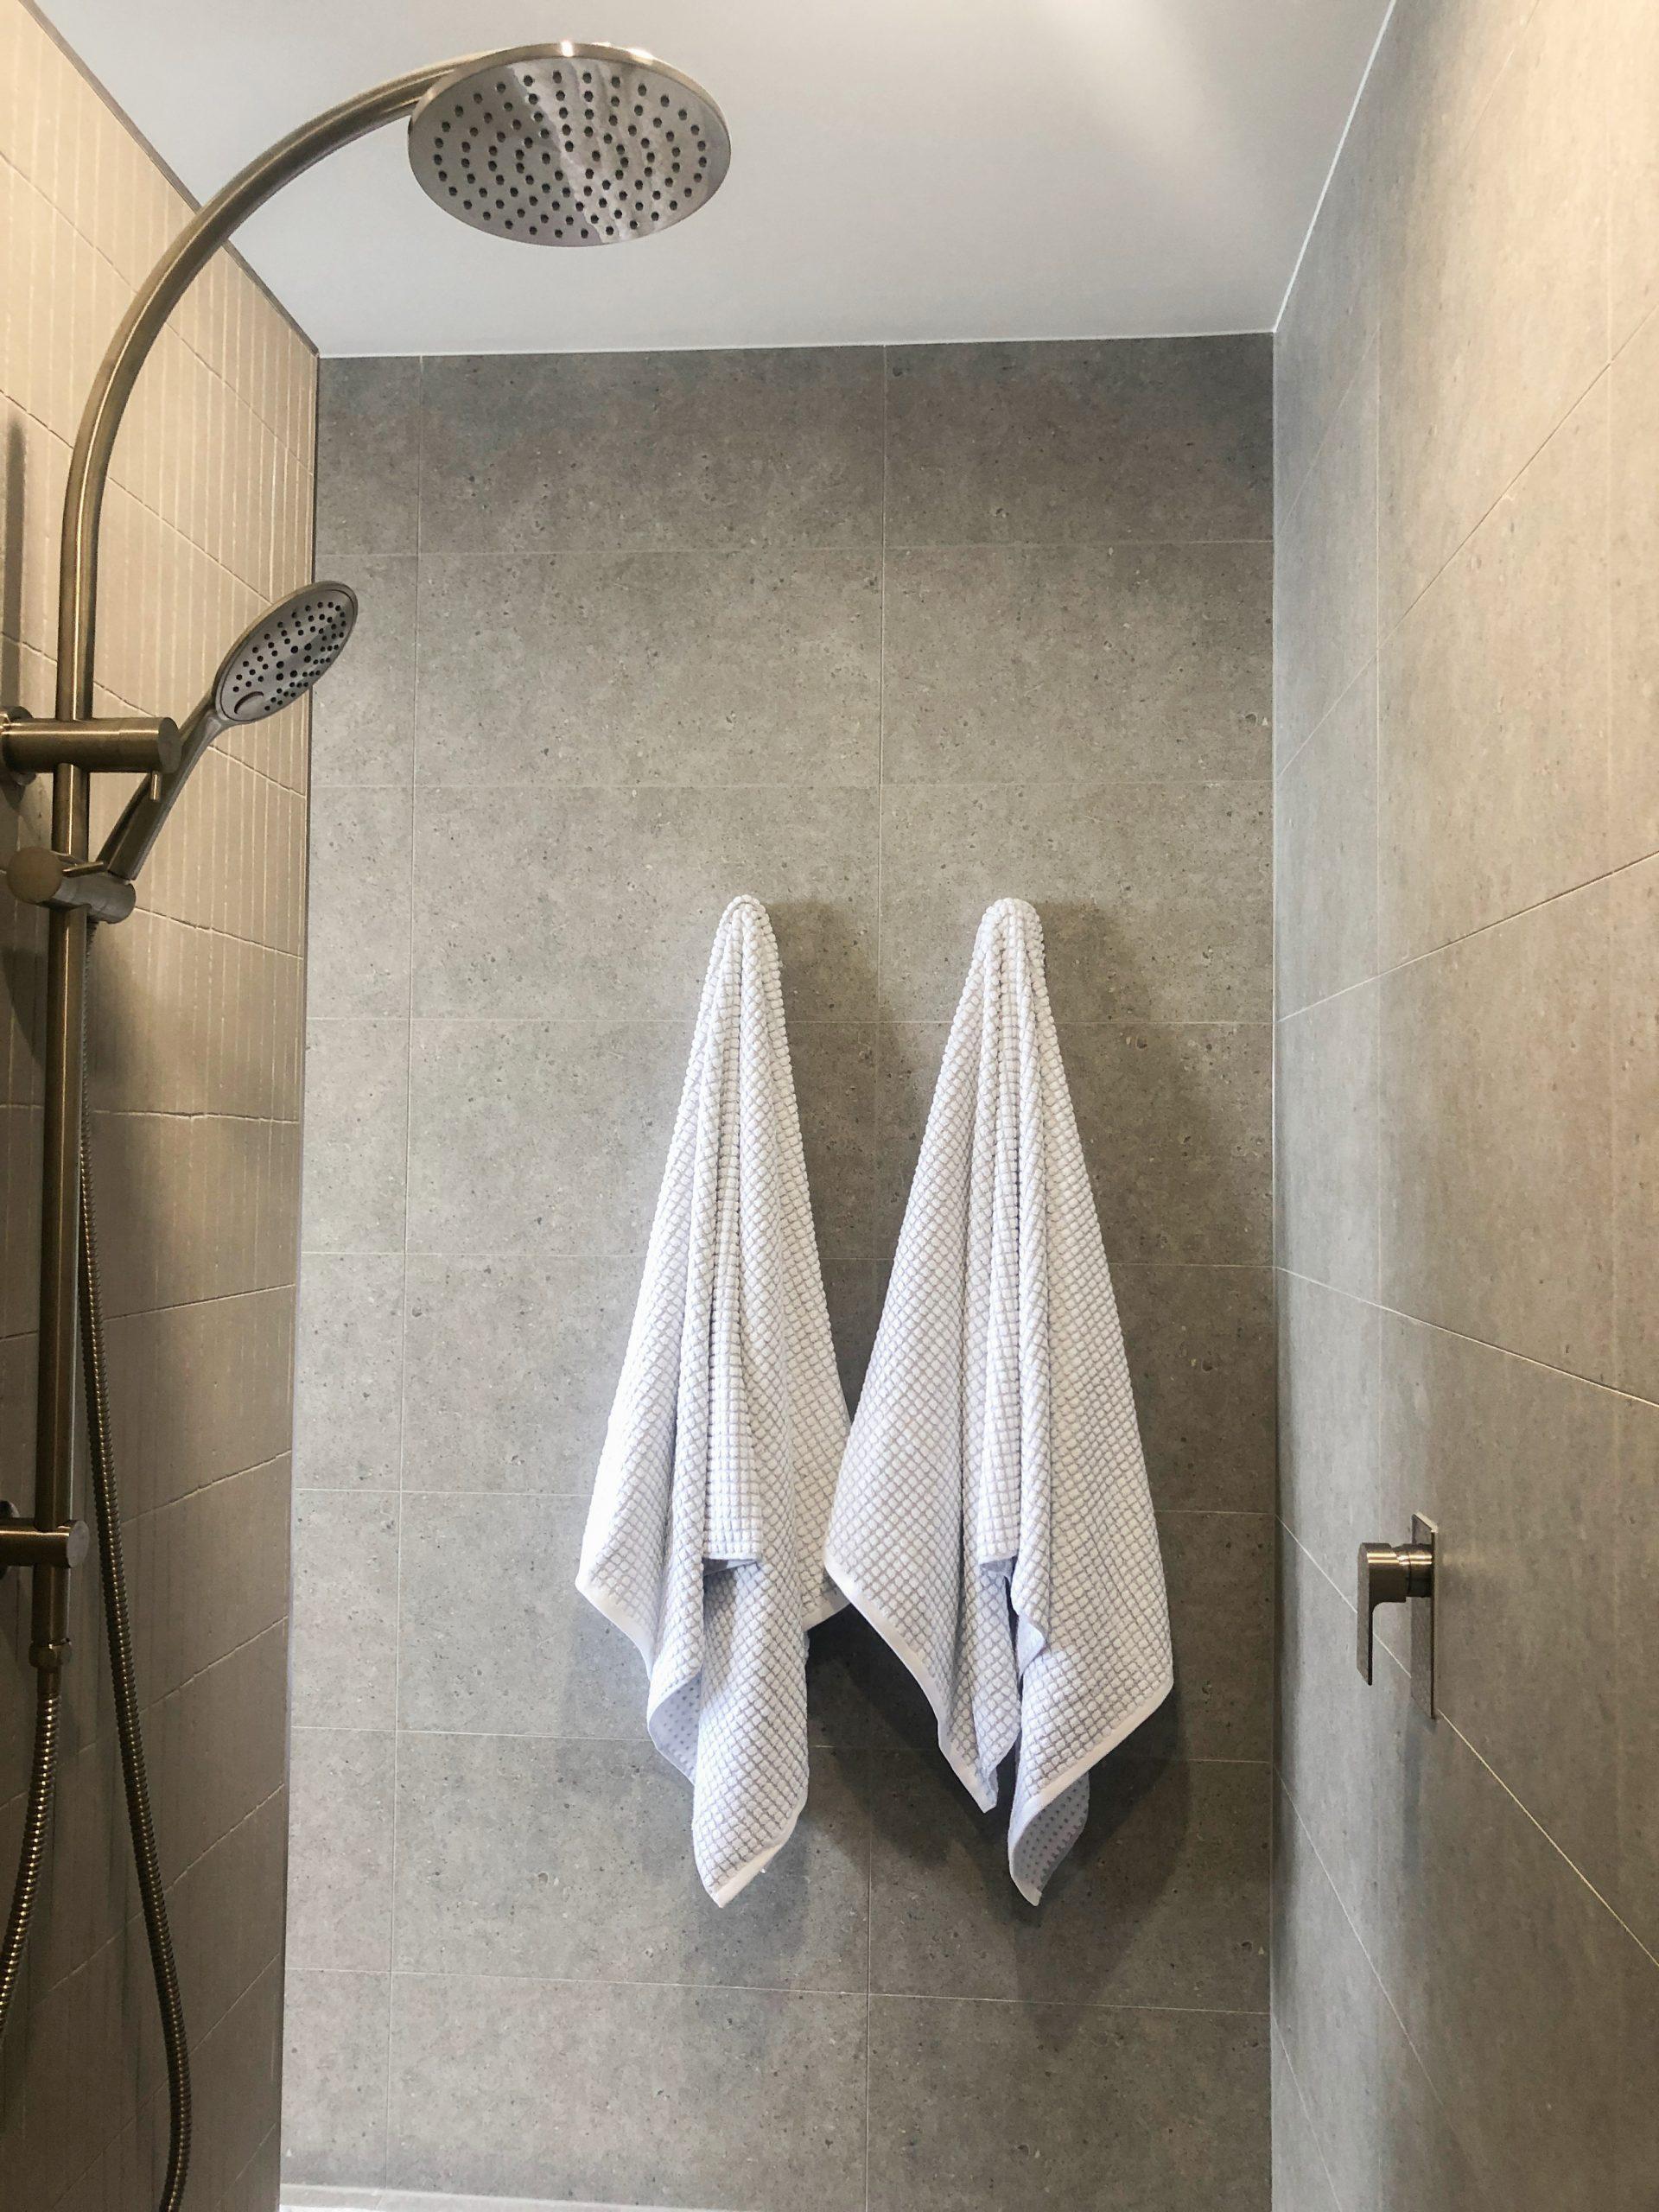 https://www.ivyandfinch.com.au/wp-content/uploads/2021/02/Bracken-Ridge-Interior-Design-Bathroom-Styling-scaled.jpg